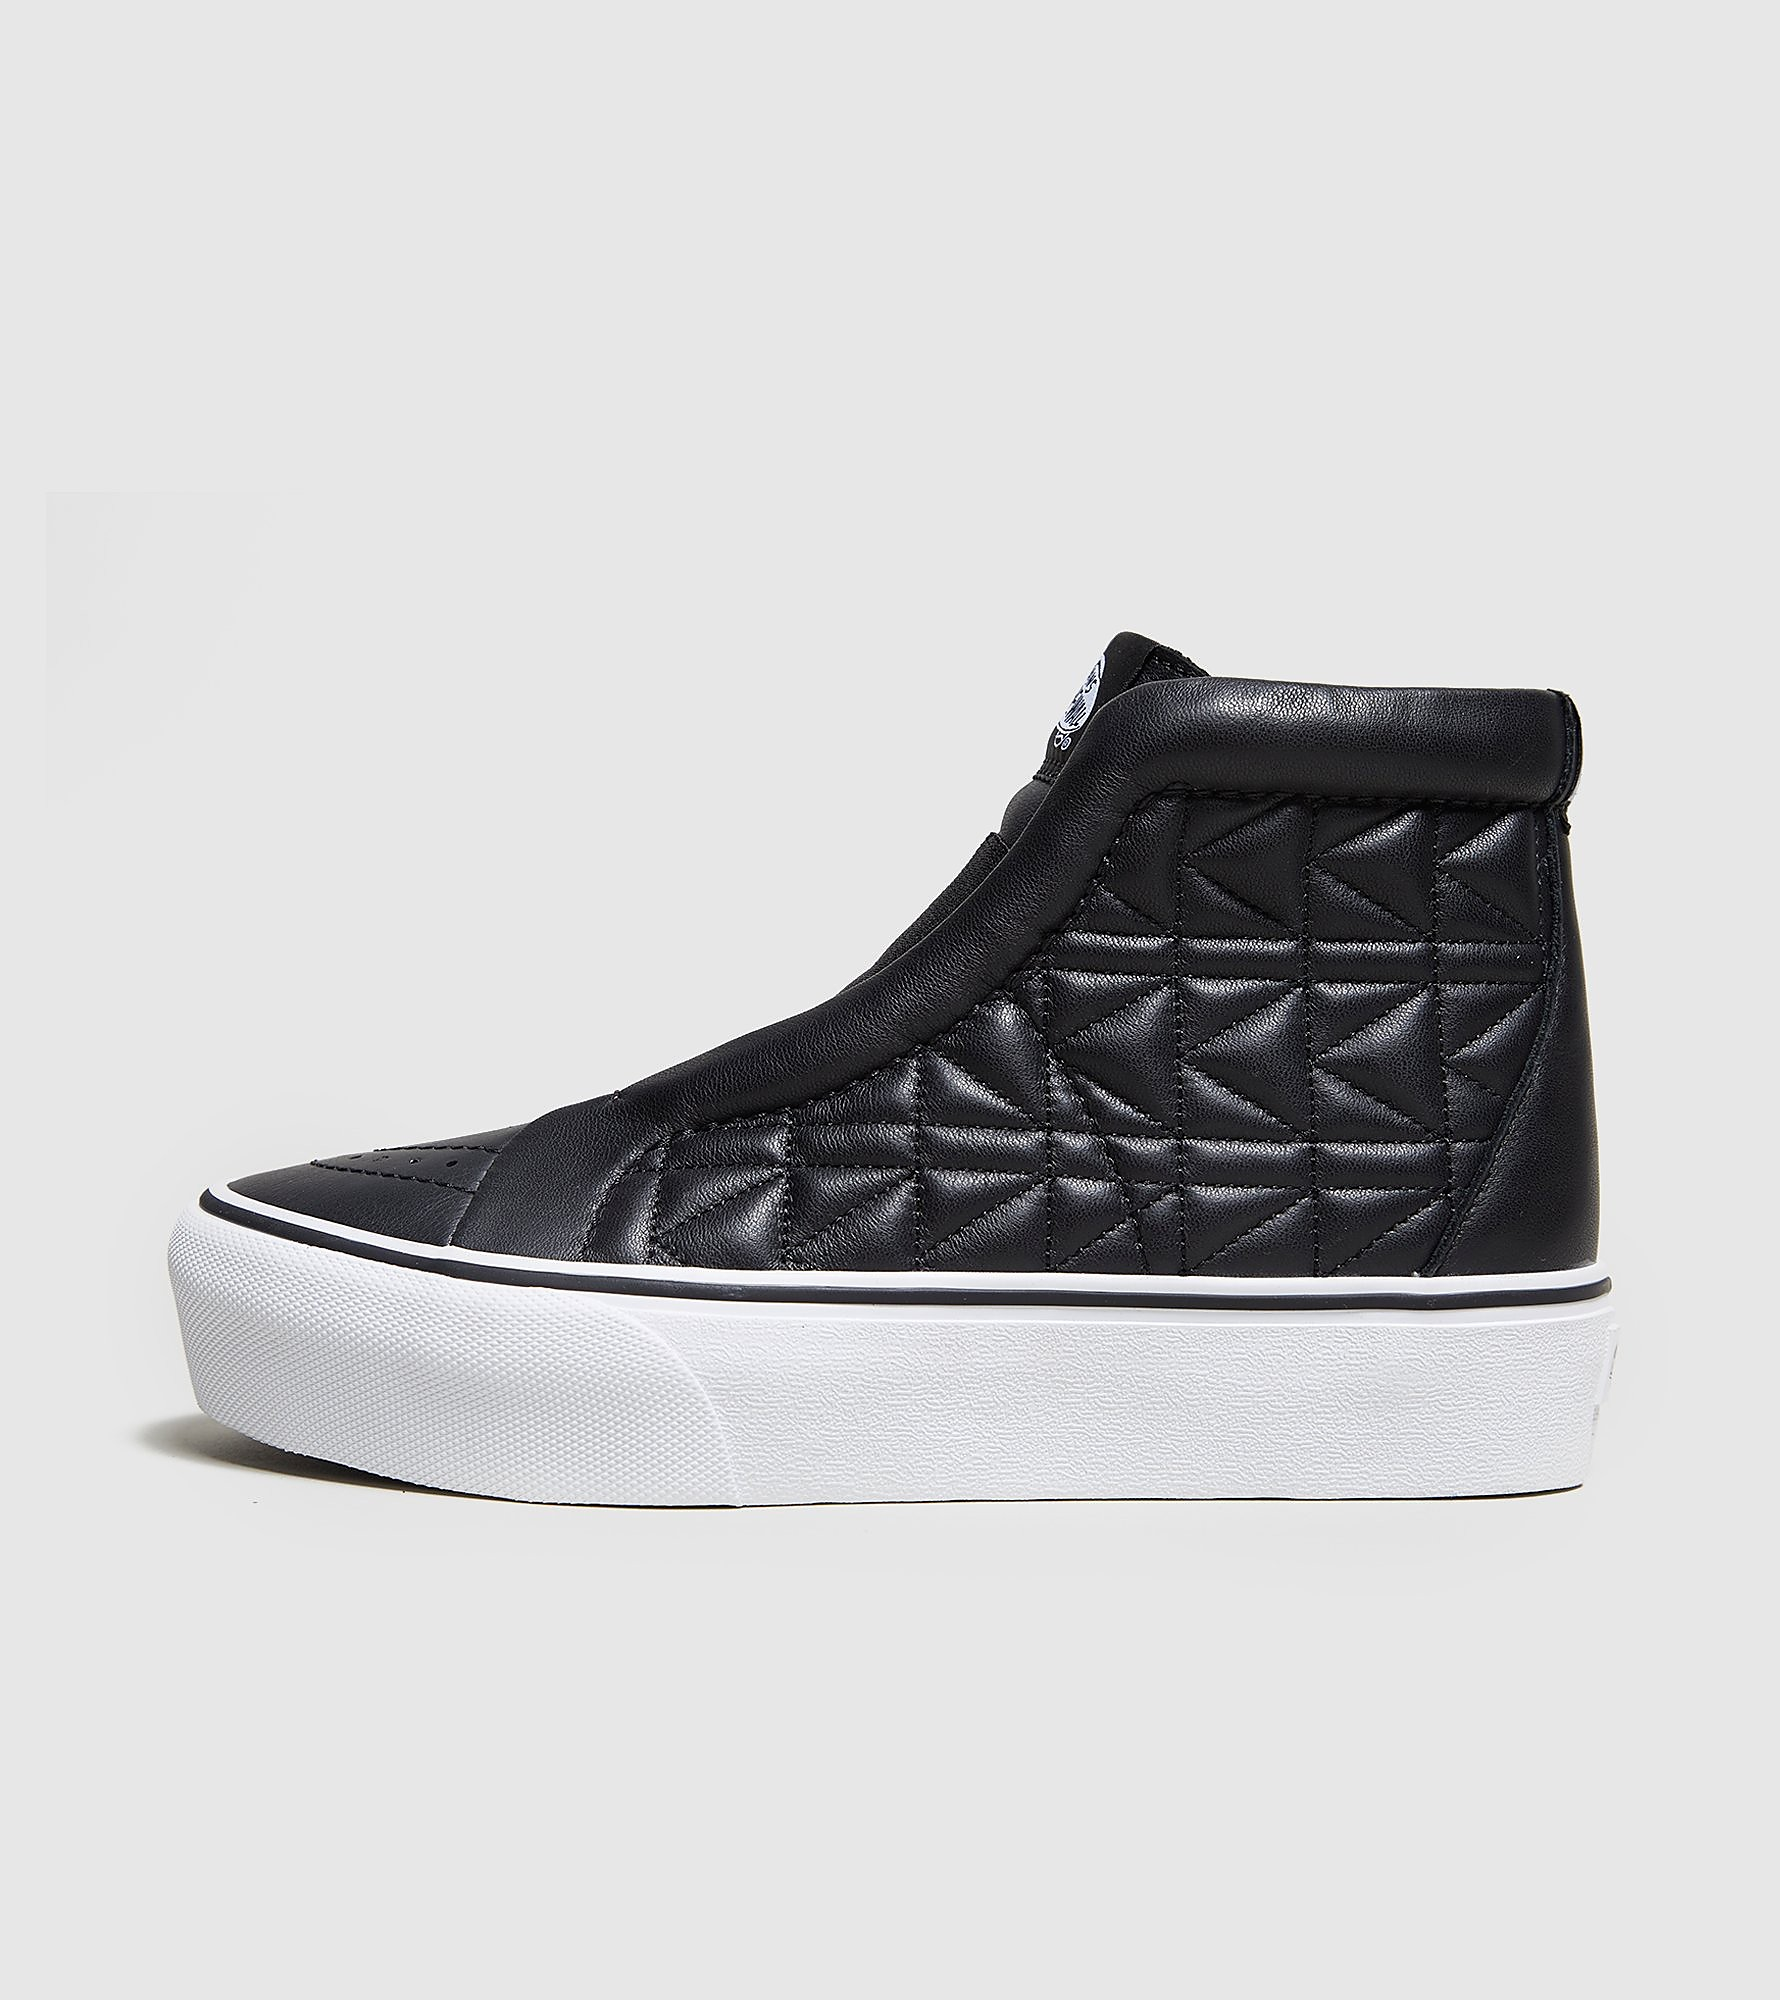 Vans SK8-Hi Laceless Platform x Karl Lagerfeld Women's, negro/blanco